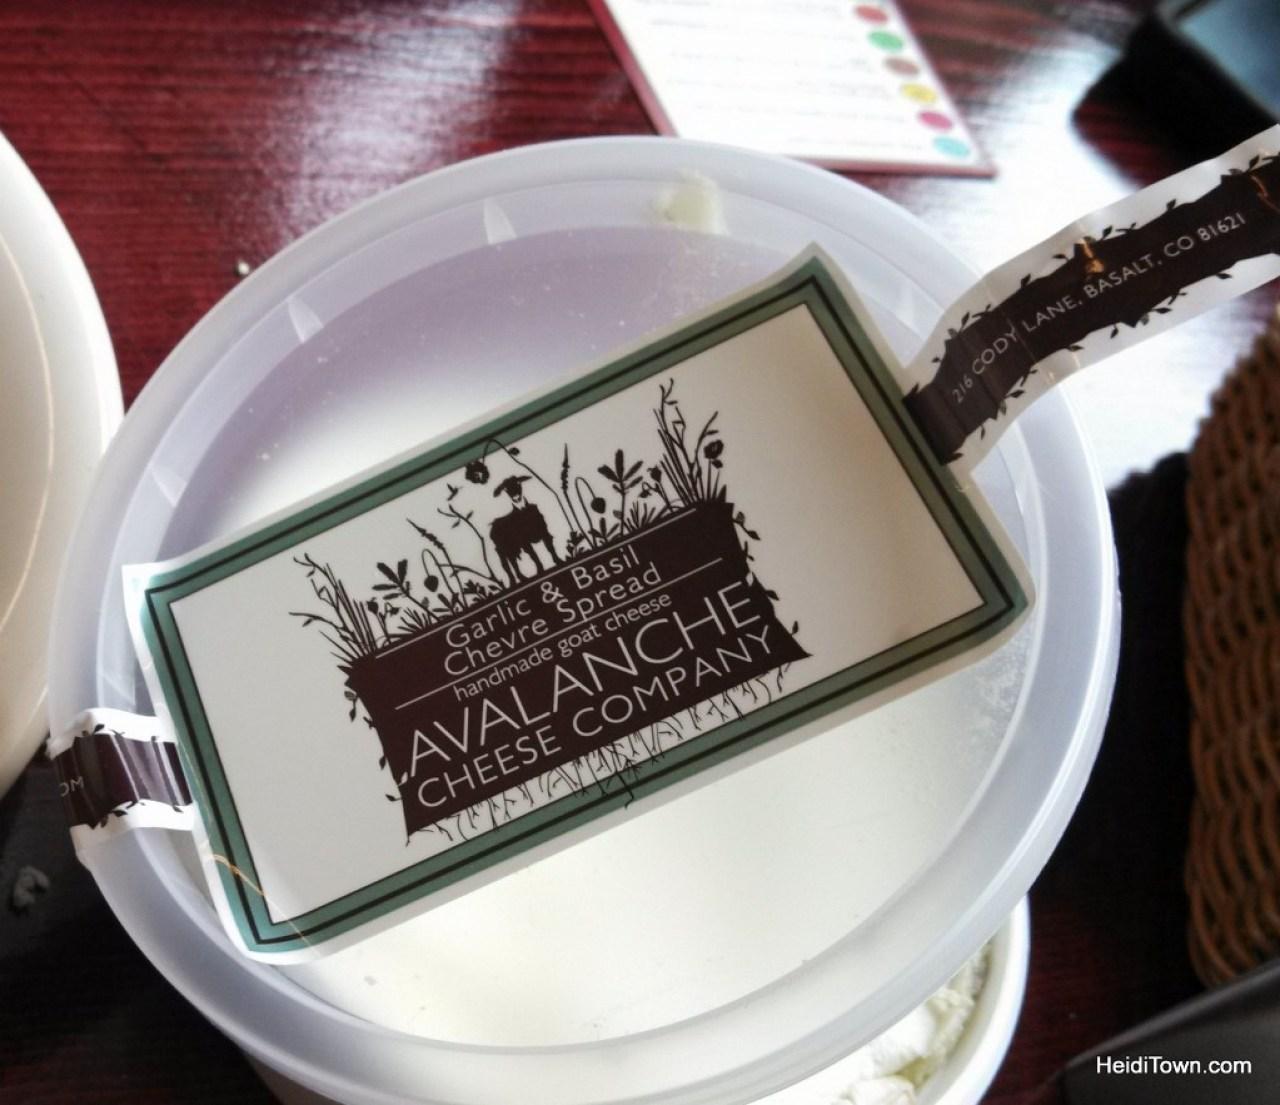 Avalanche cheese Colorado. HeidiTown.com